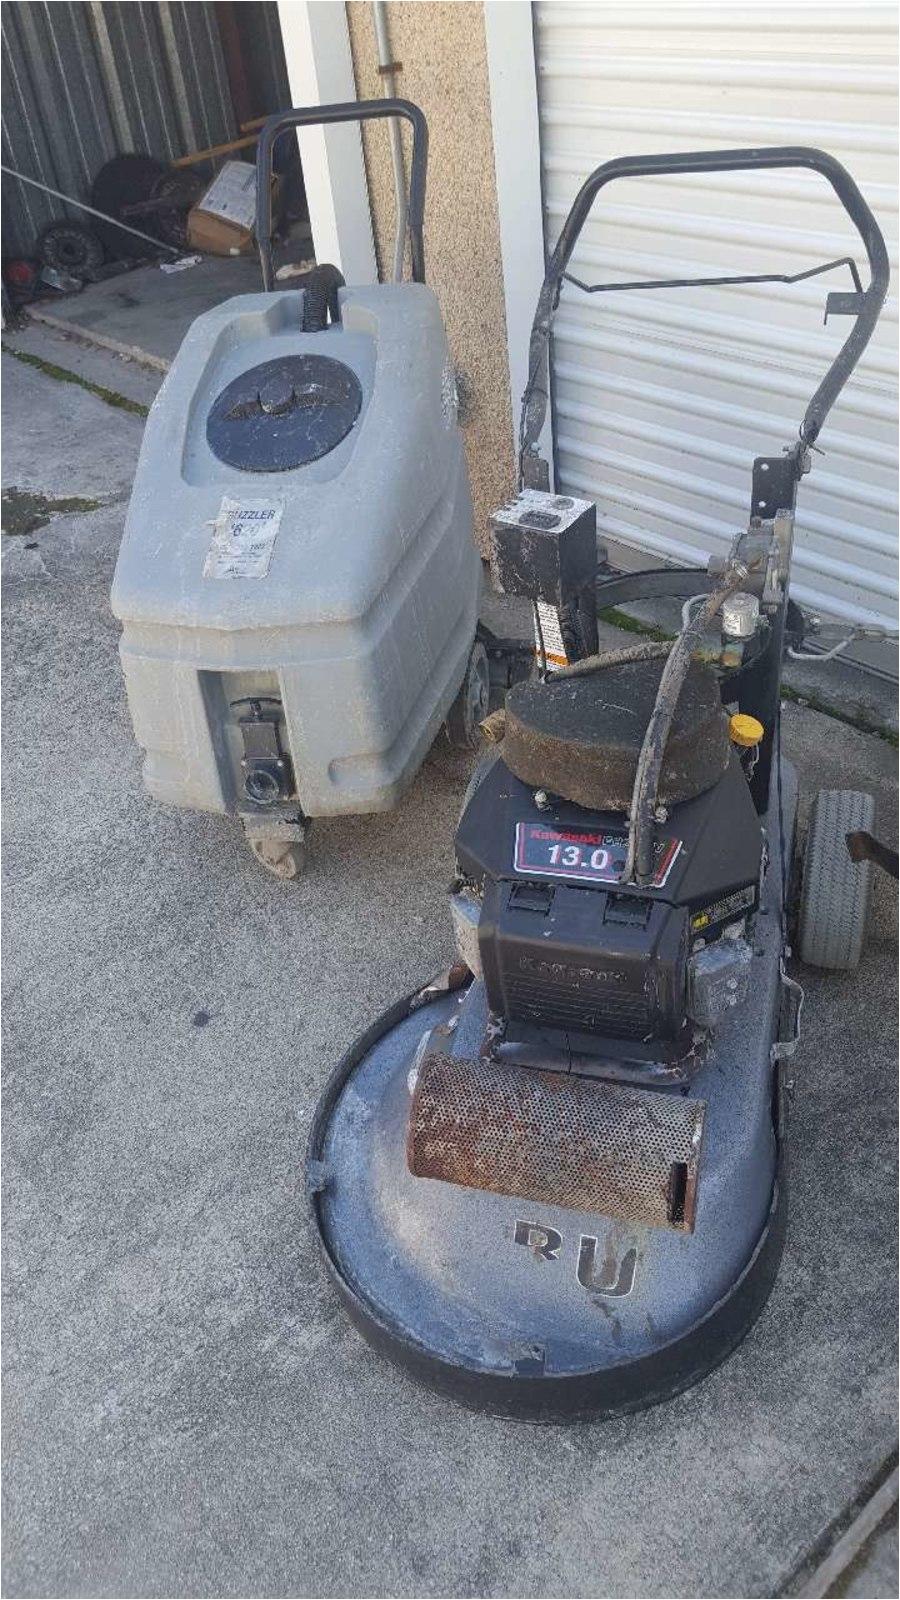 Propane Powered Floor Scraper Used Propane Stripper and Guzzle Phone Number Hidden In Durham